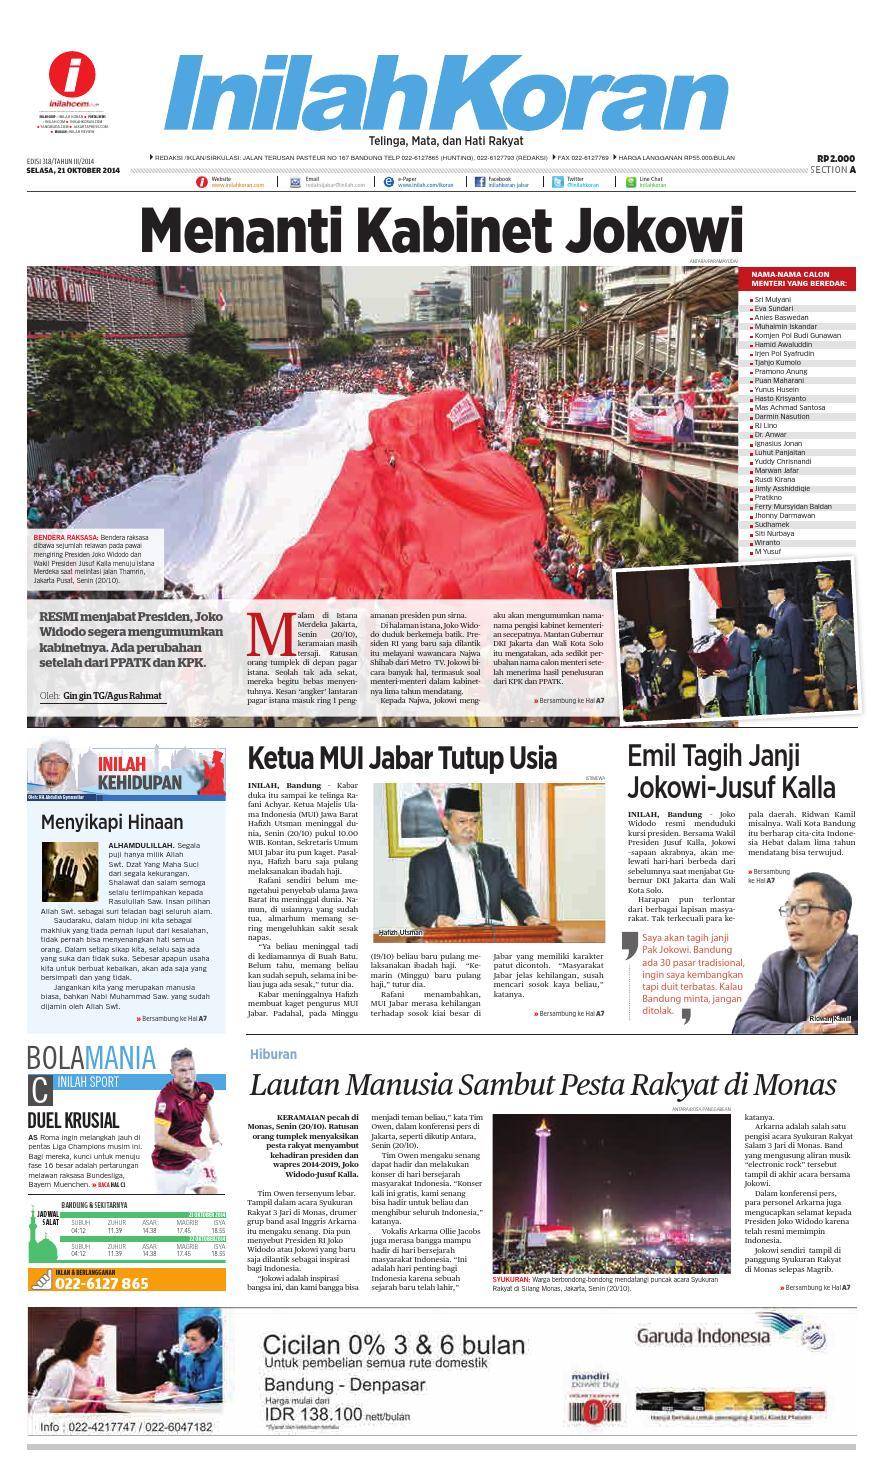 Menanti Kabinet Jokowi By Inilah Koran Issuu